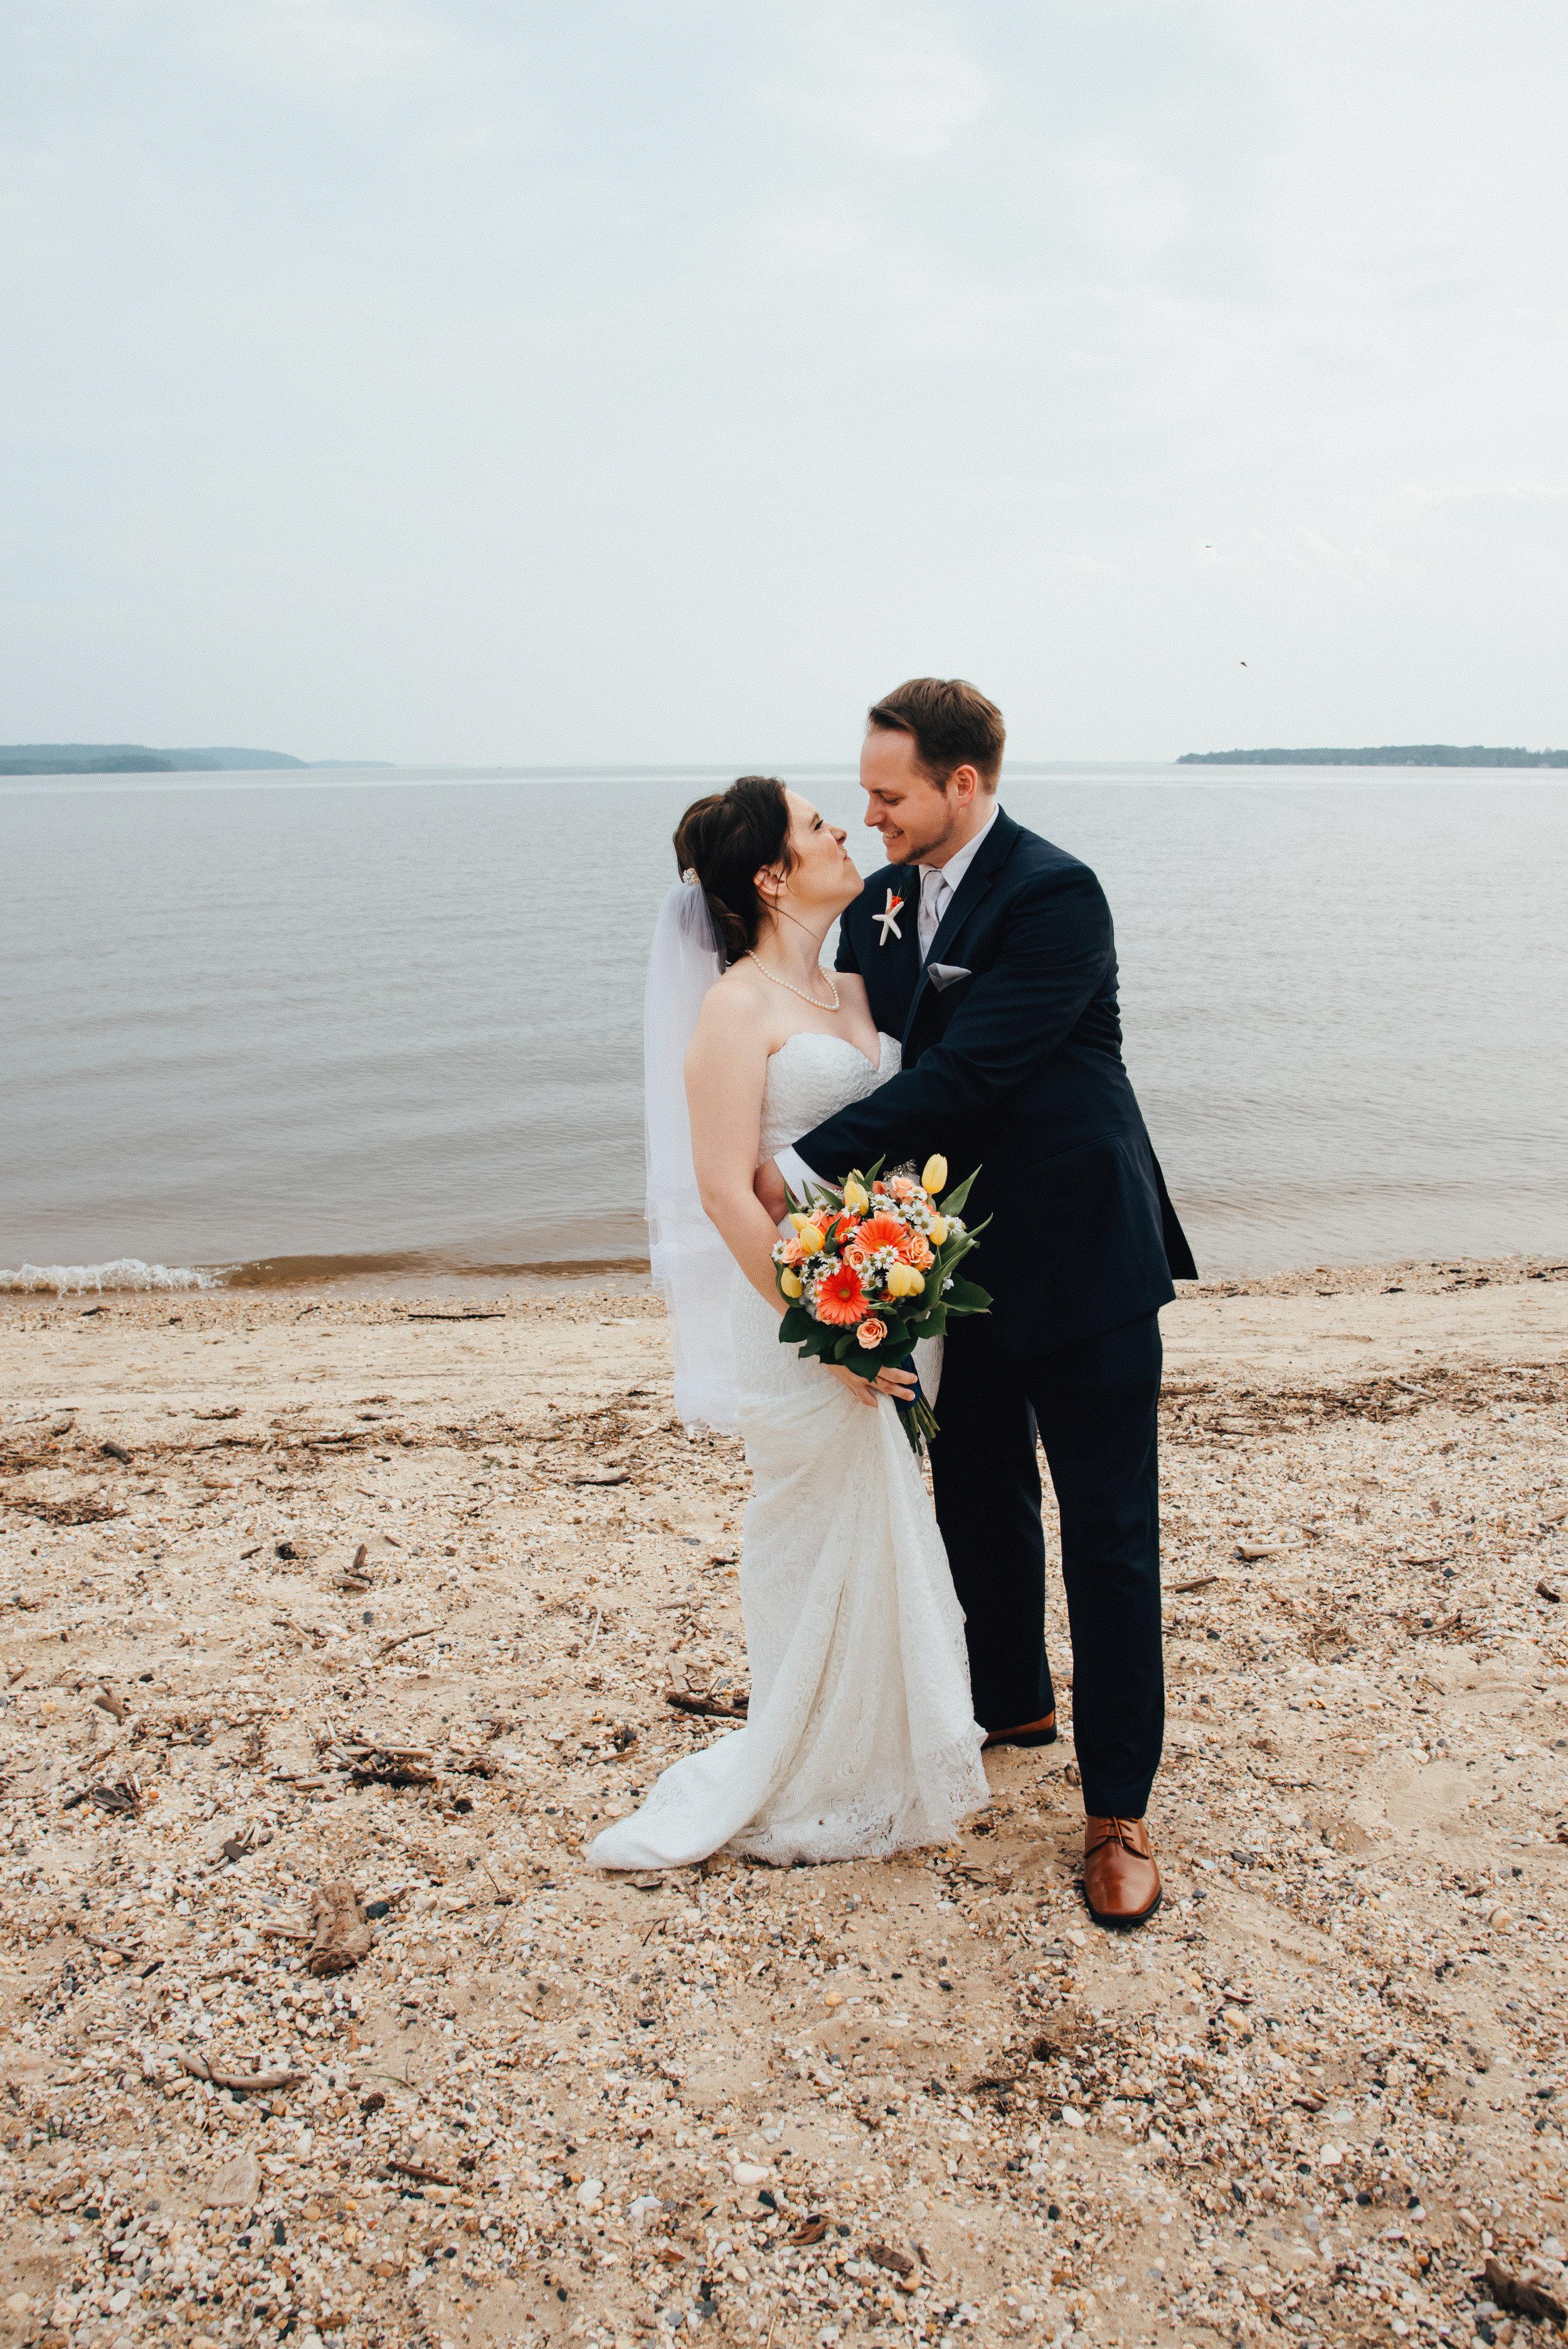 20180828_weddingwebsite_small_75.jpg